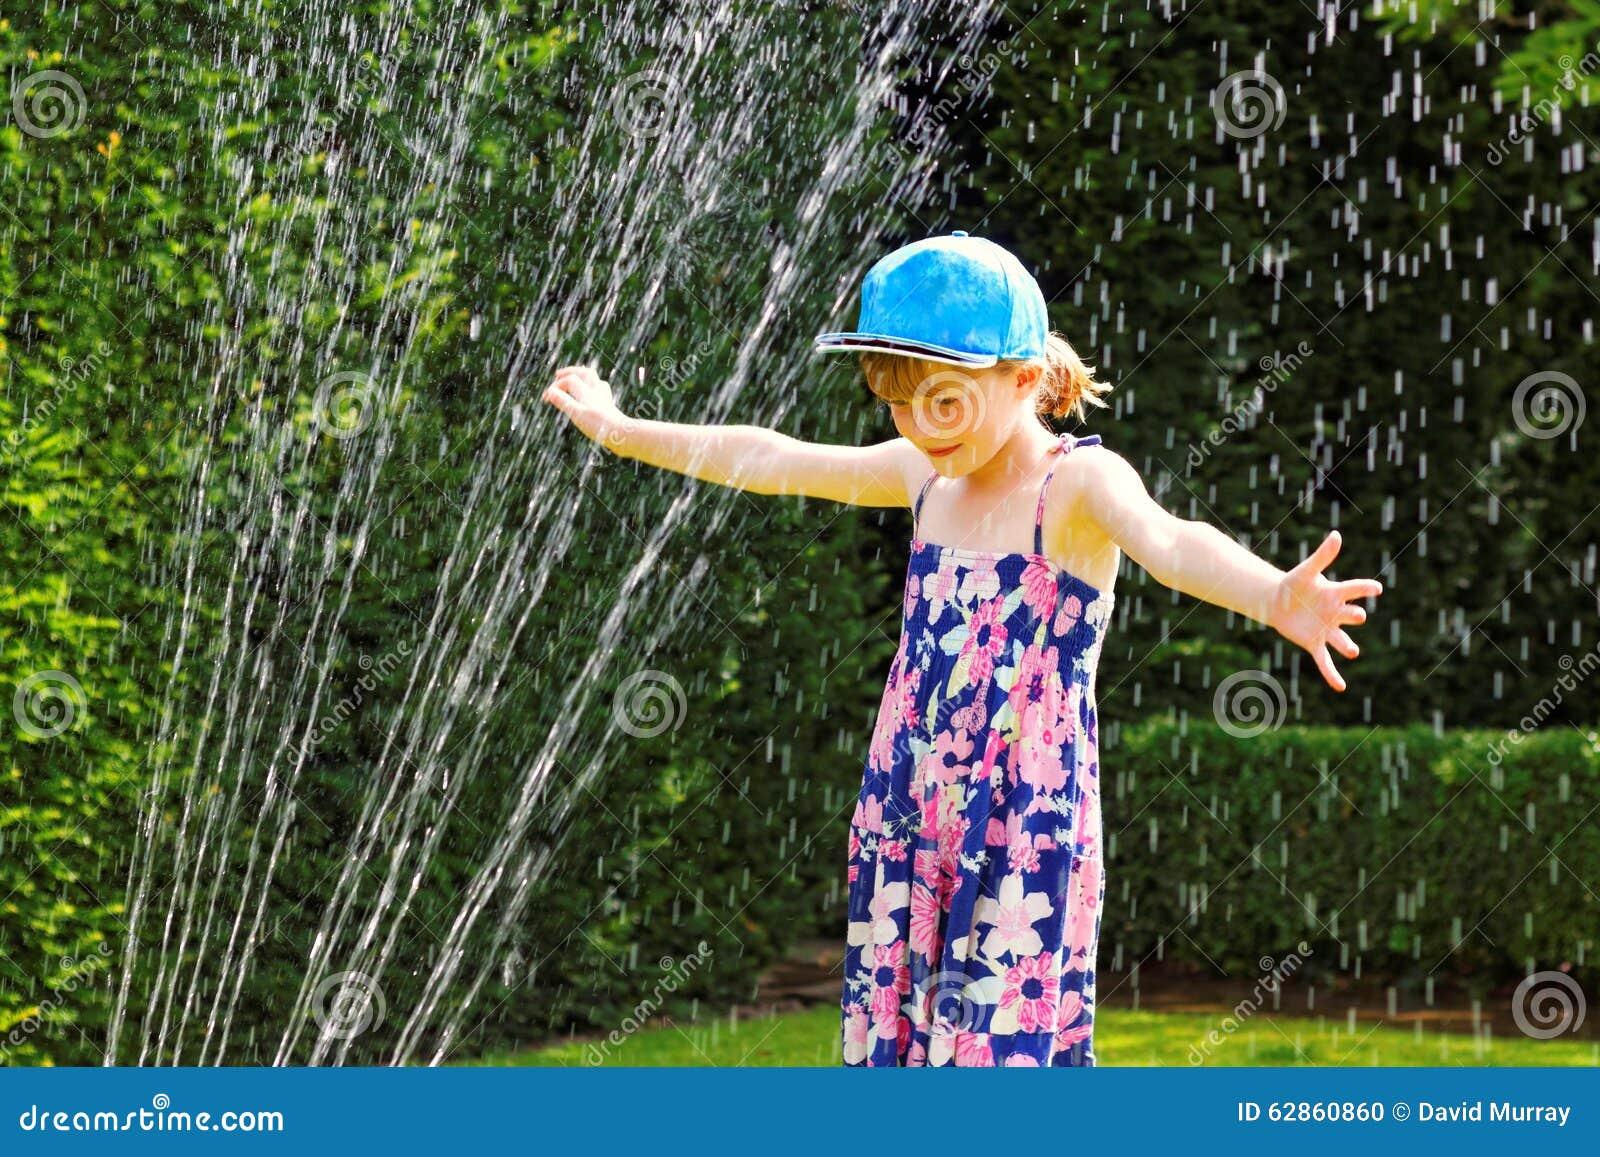 Summer fun with water sprinkler